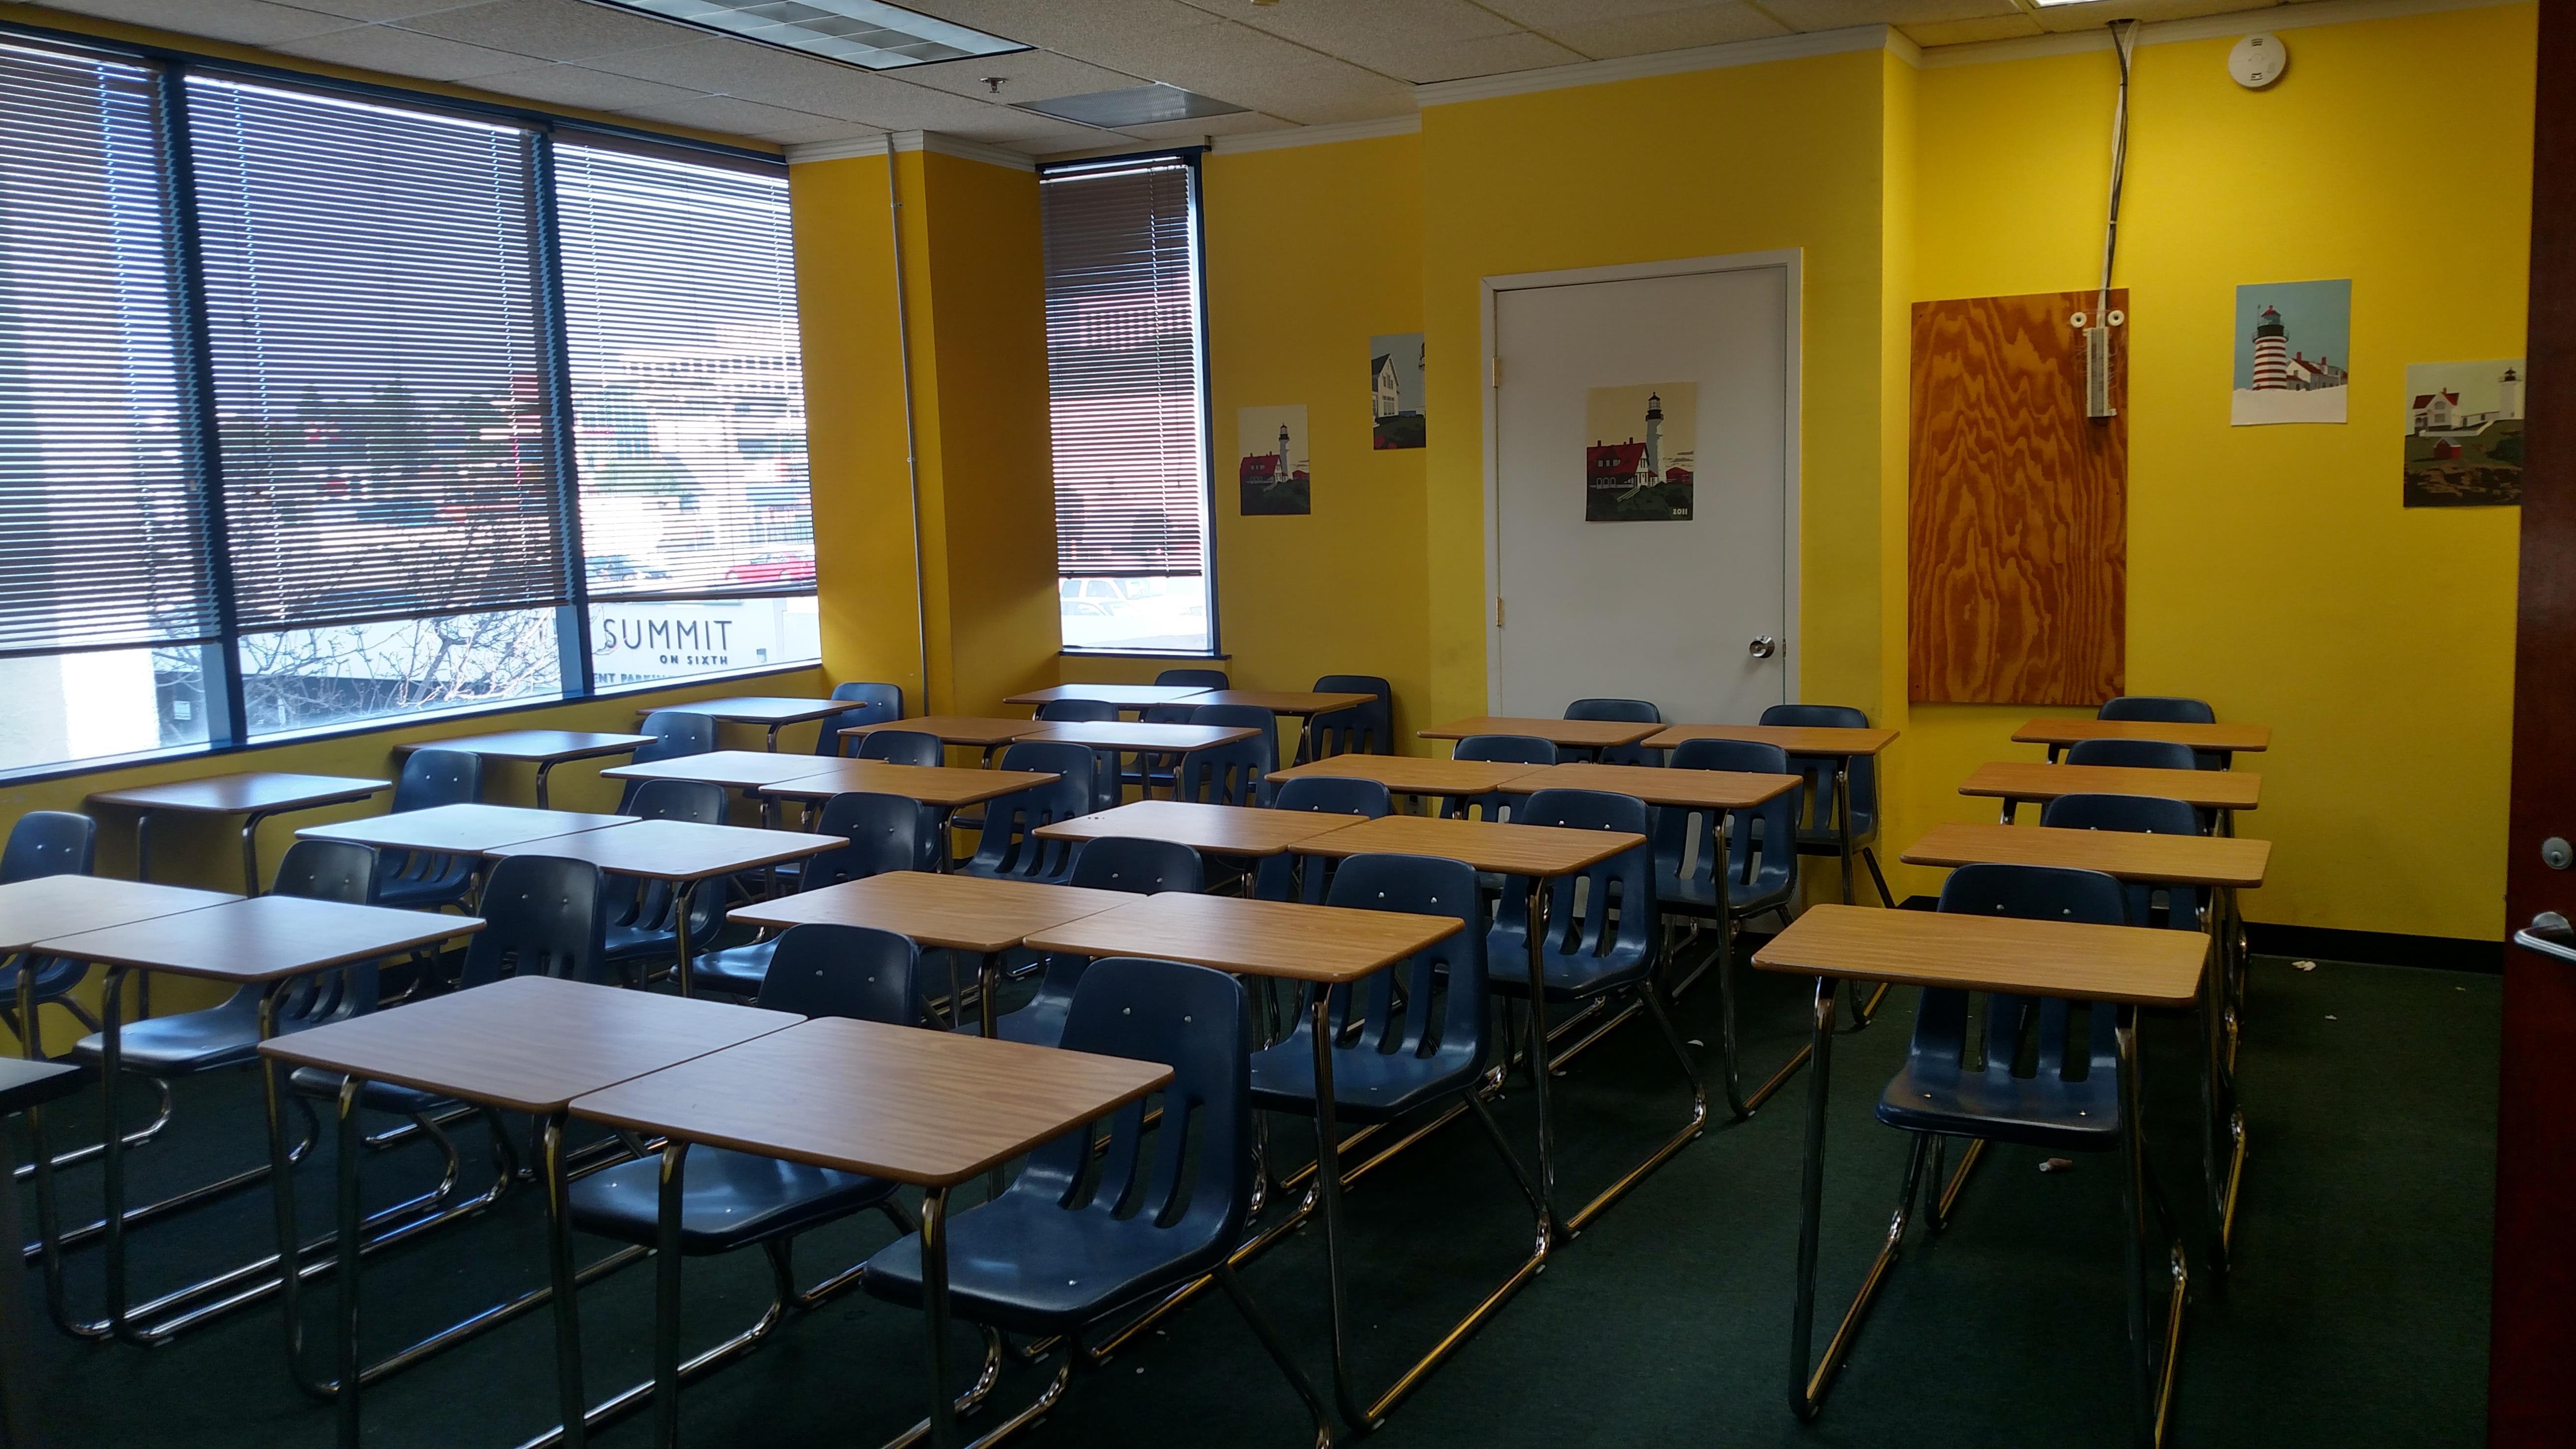 Learnet Academy, Inc. - Meeting Room 6